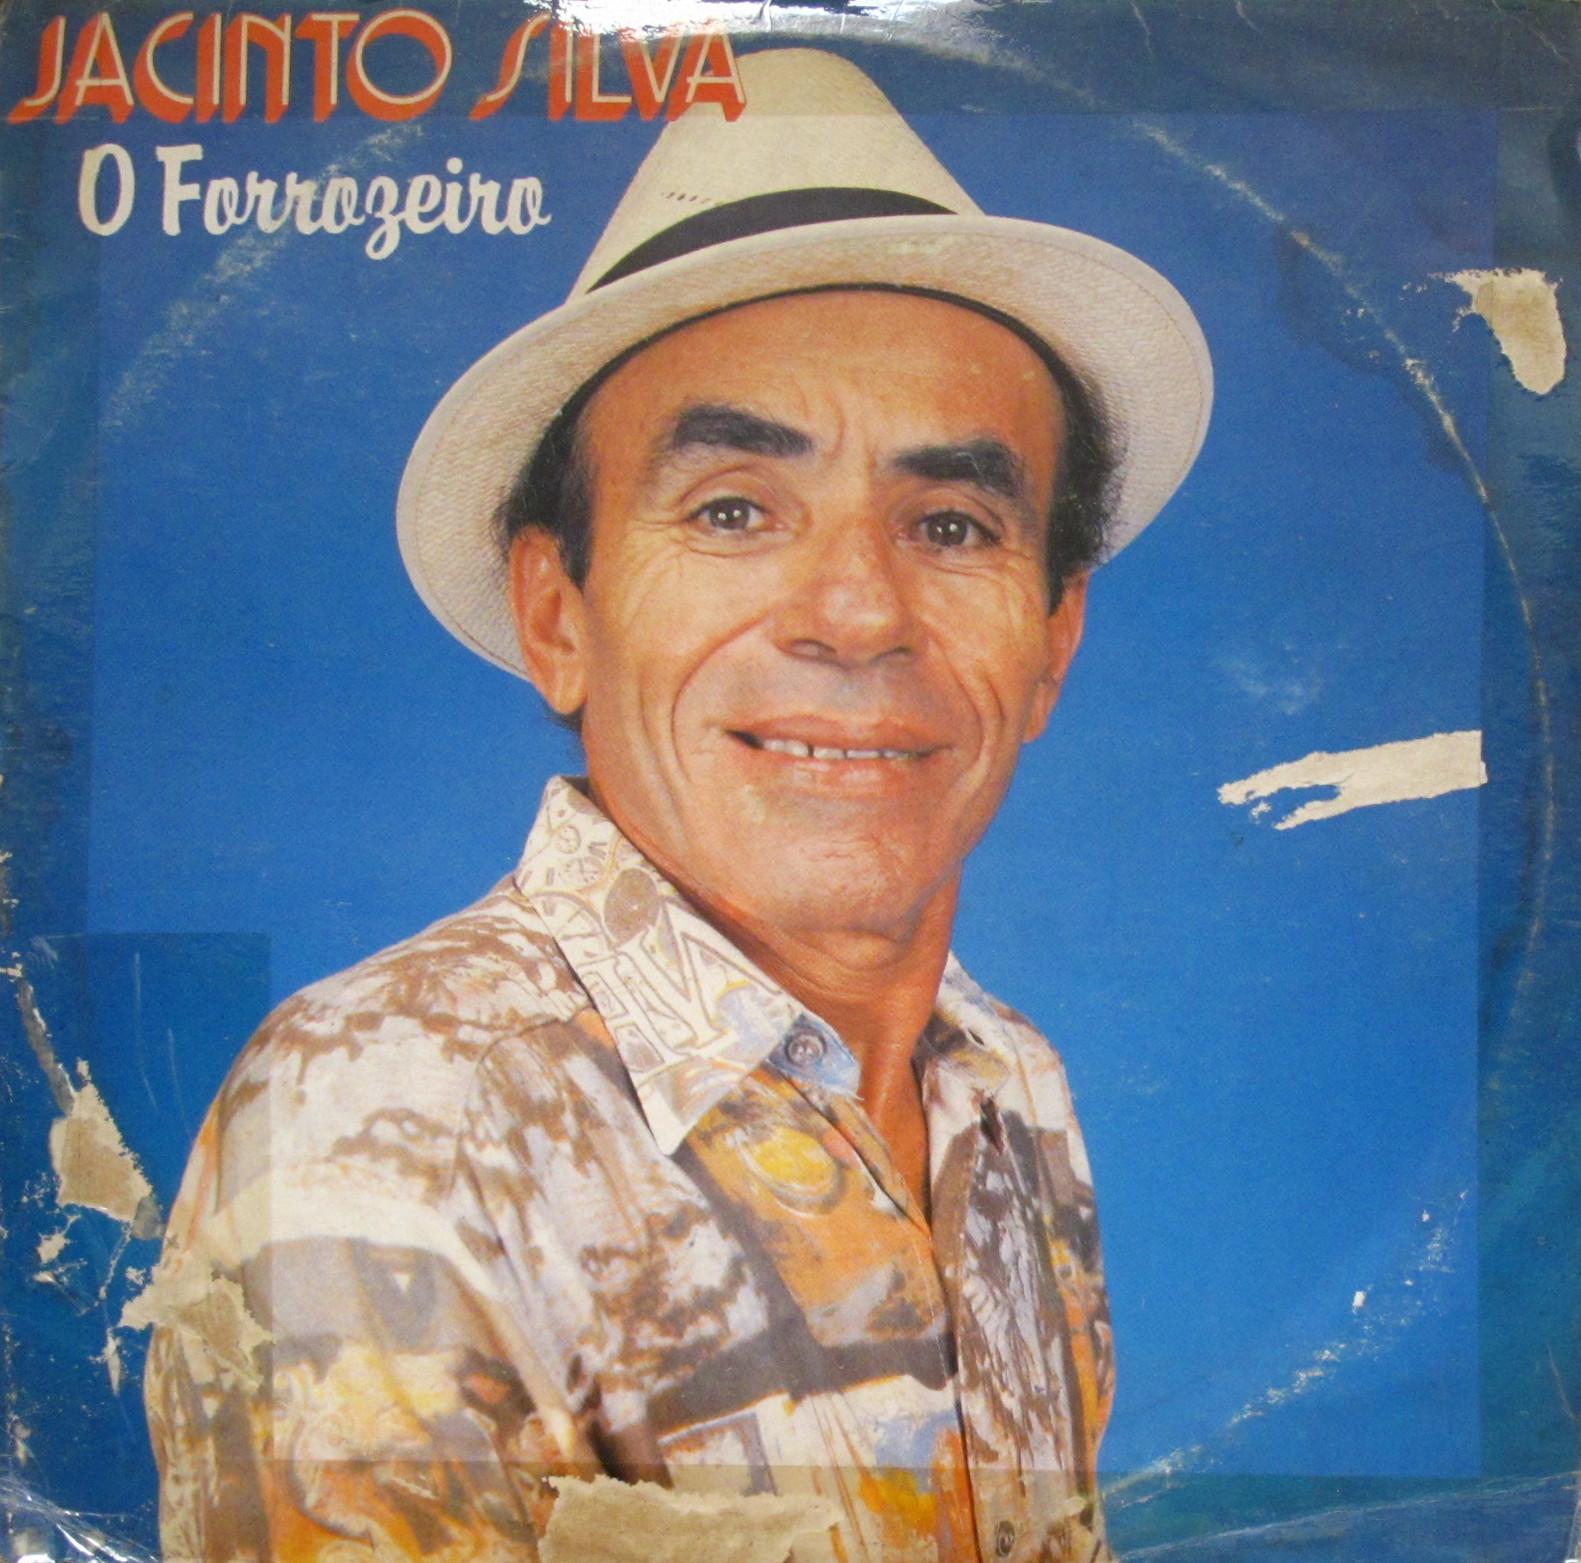 Jacimto_5